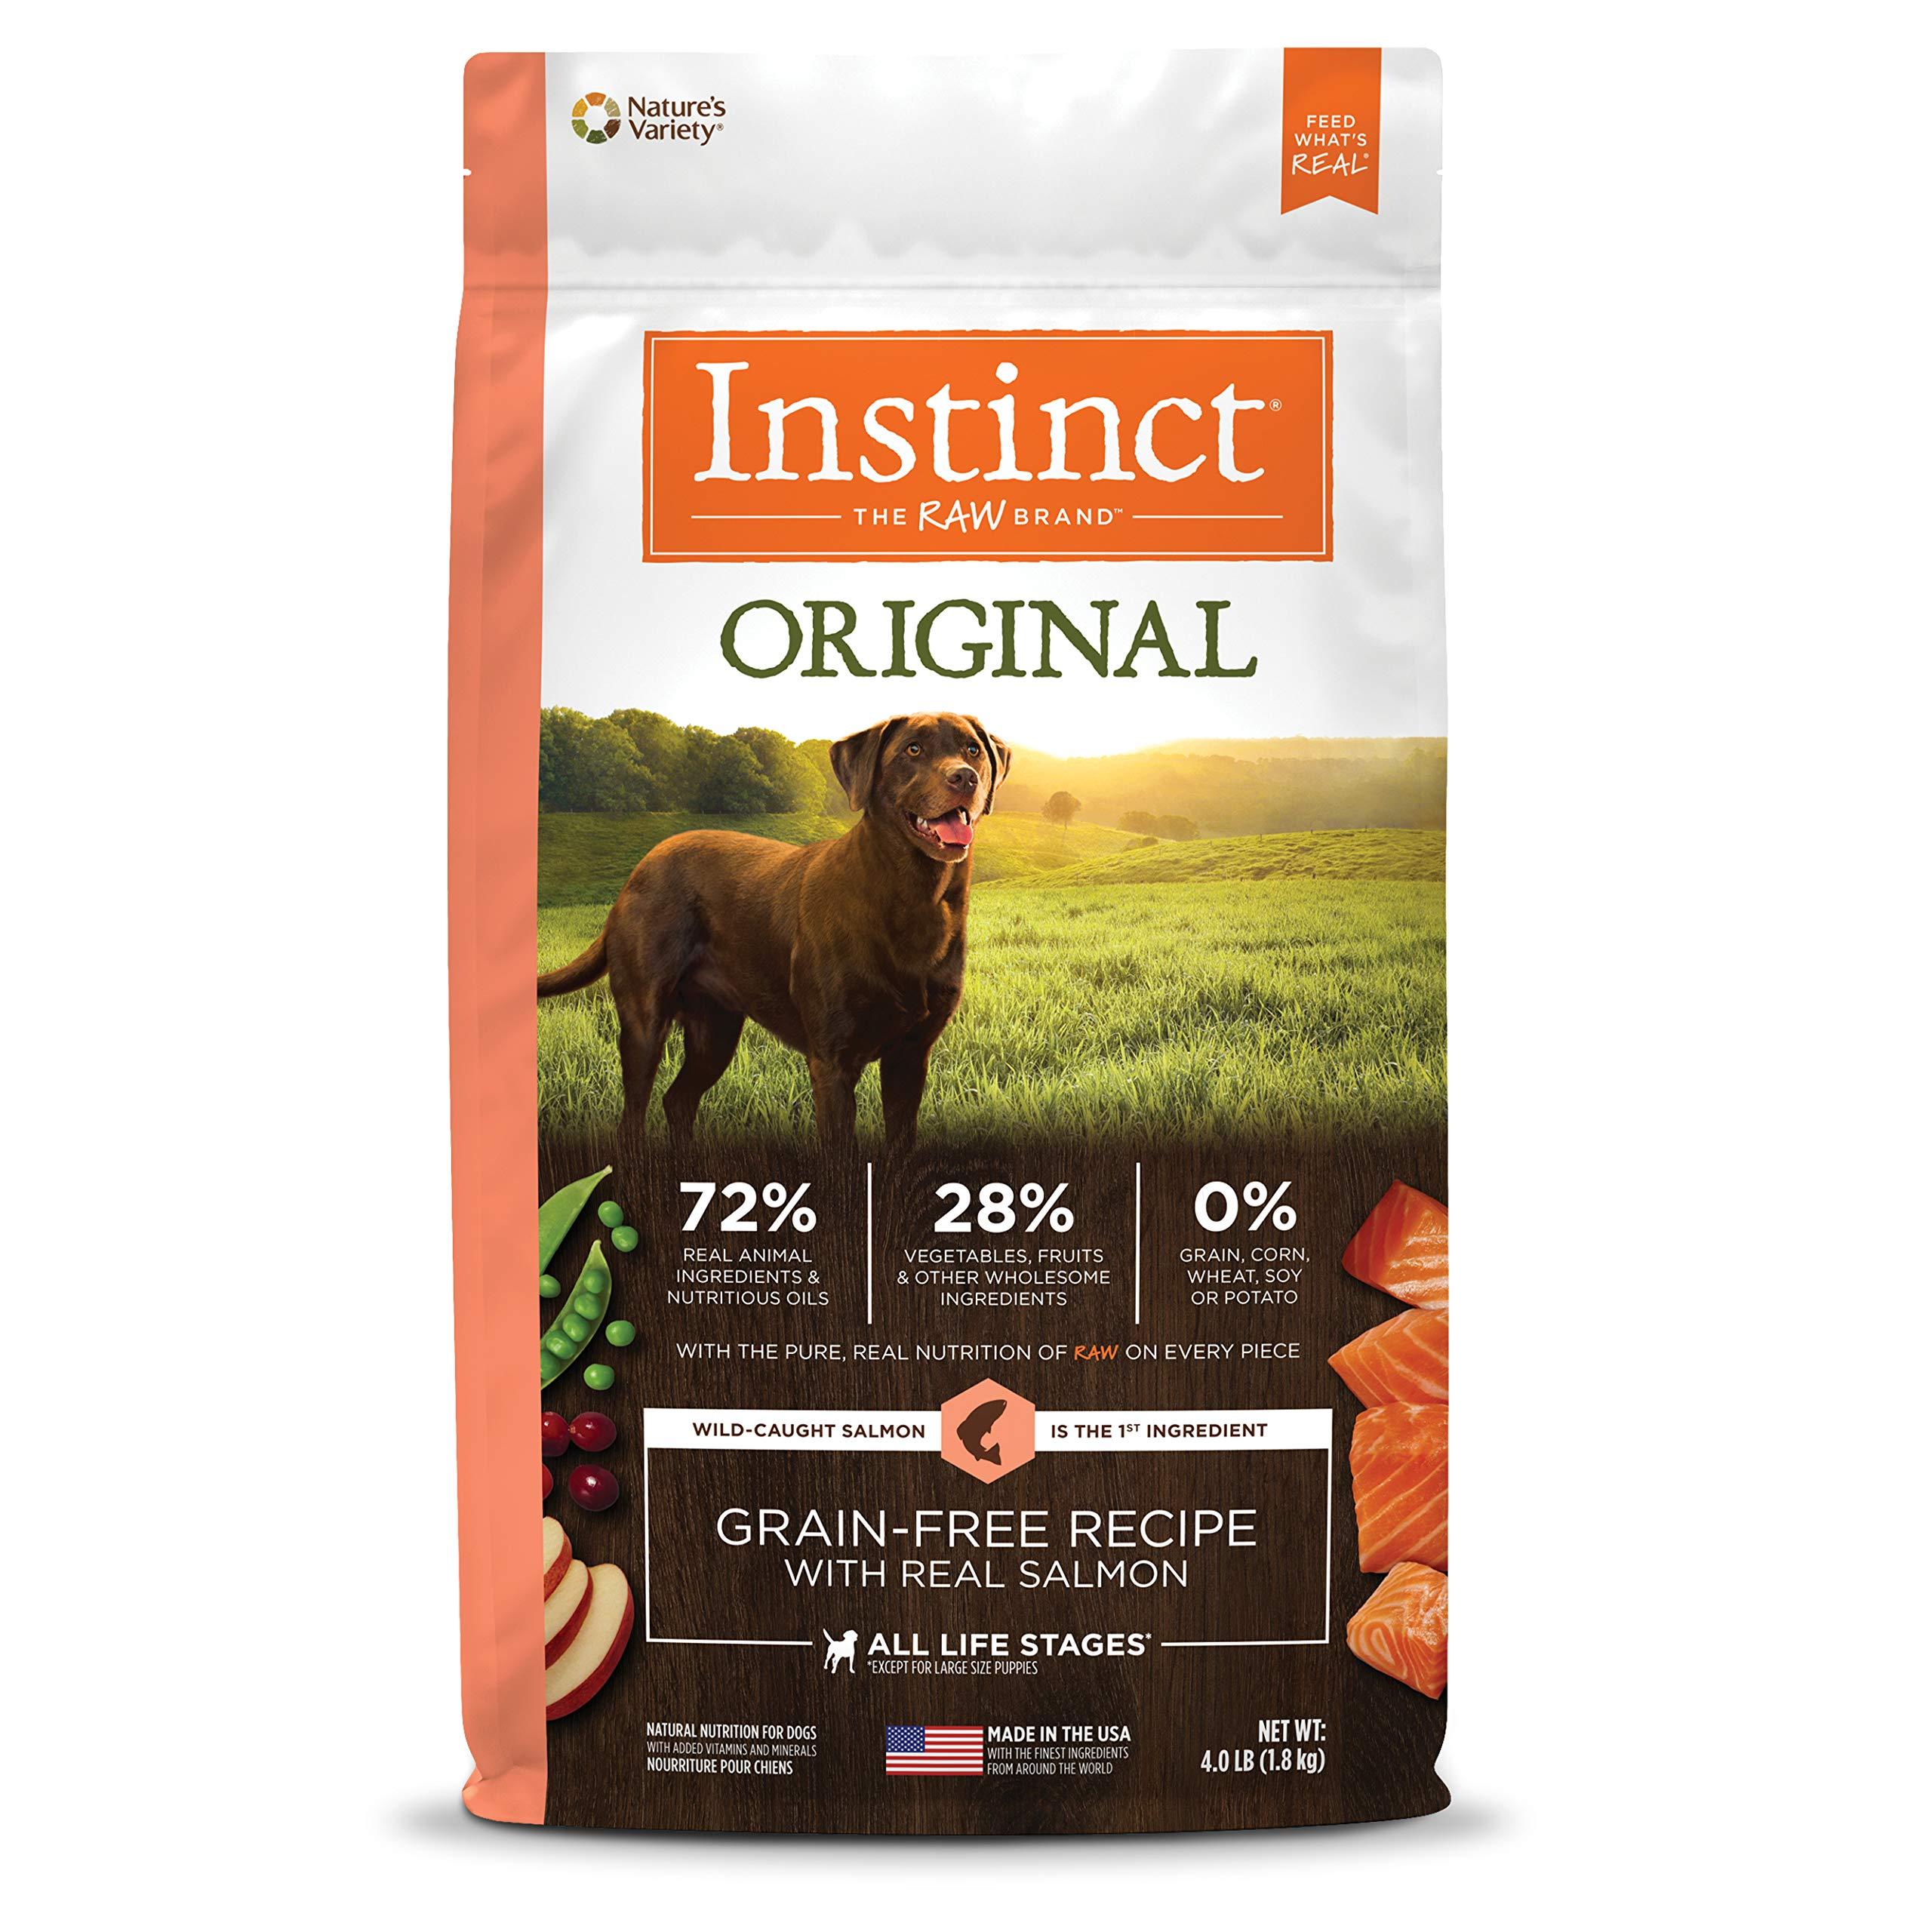 Instinct Original Grain Free Recipe Natural Dry Dog Food by Nature's Variety